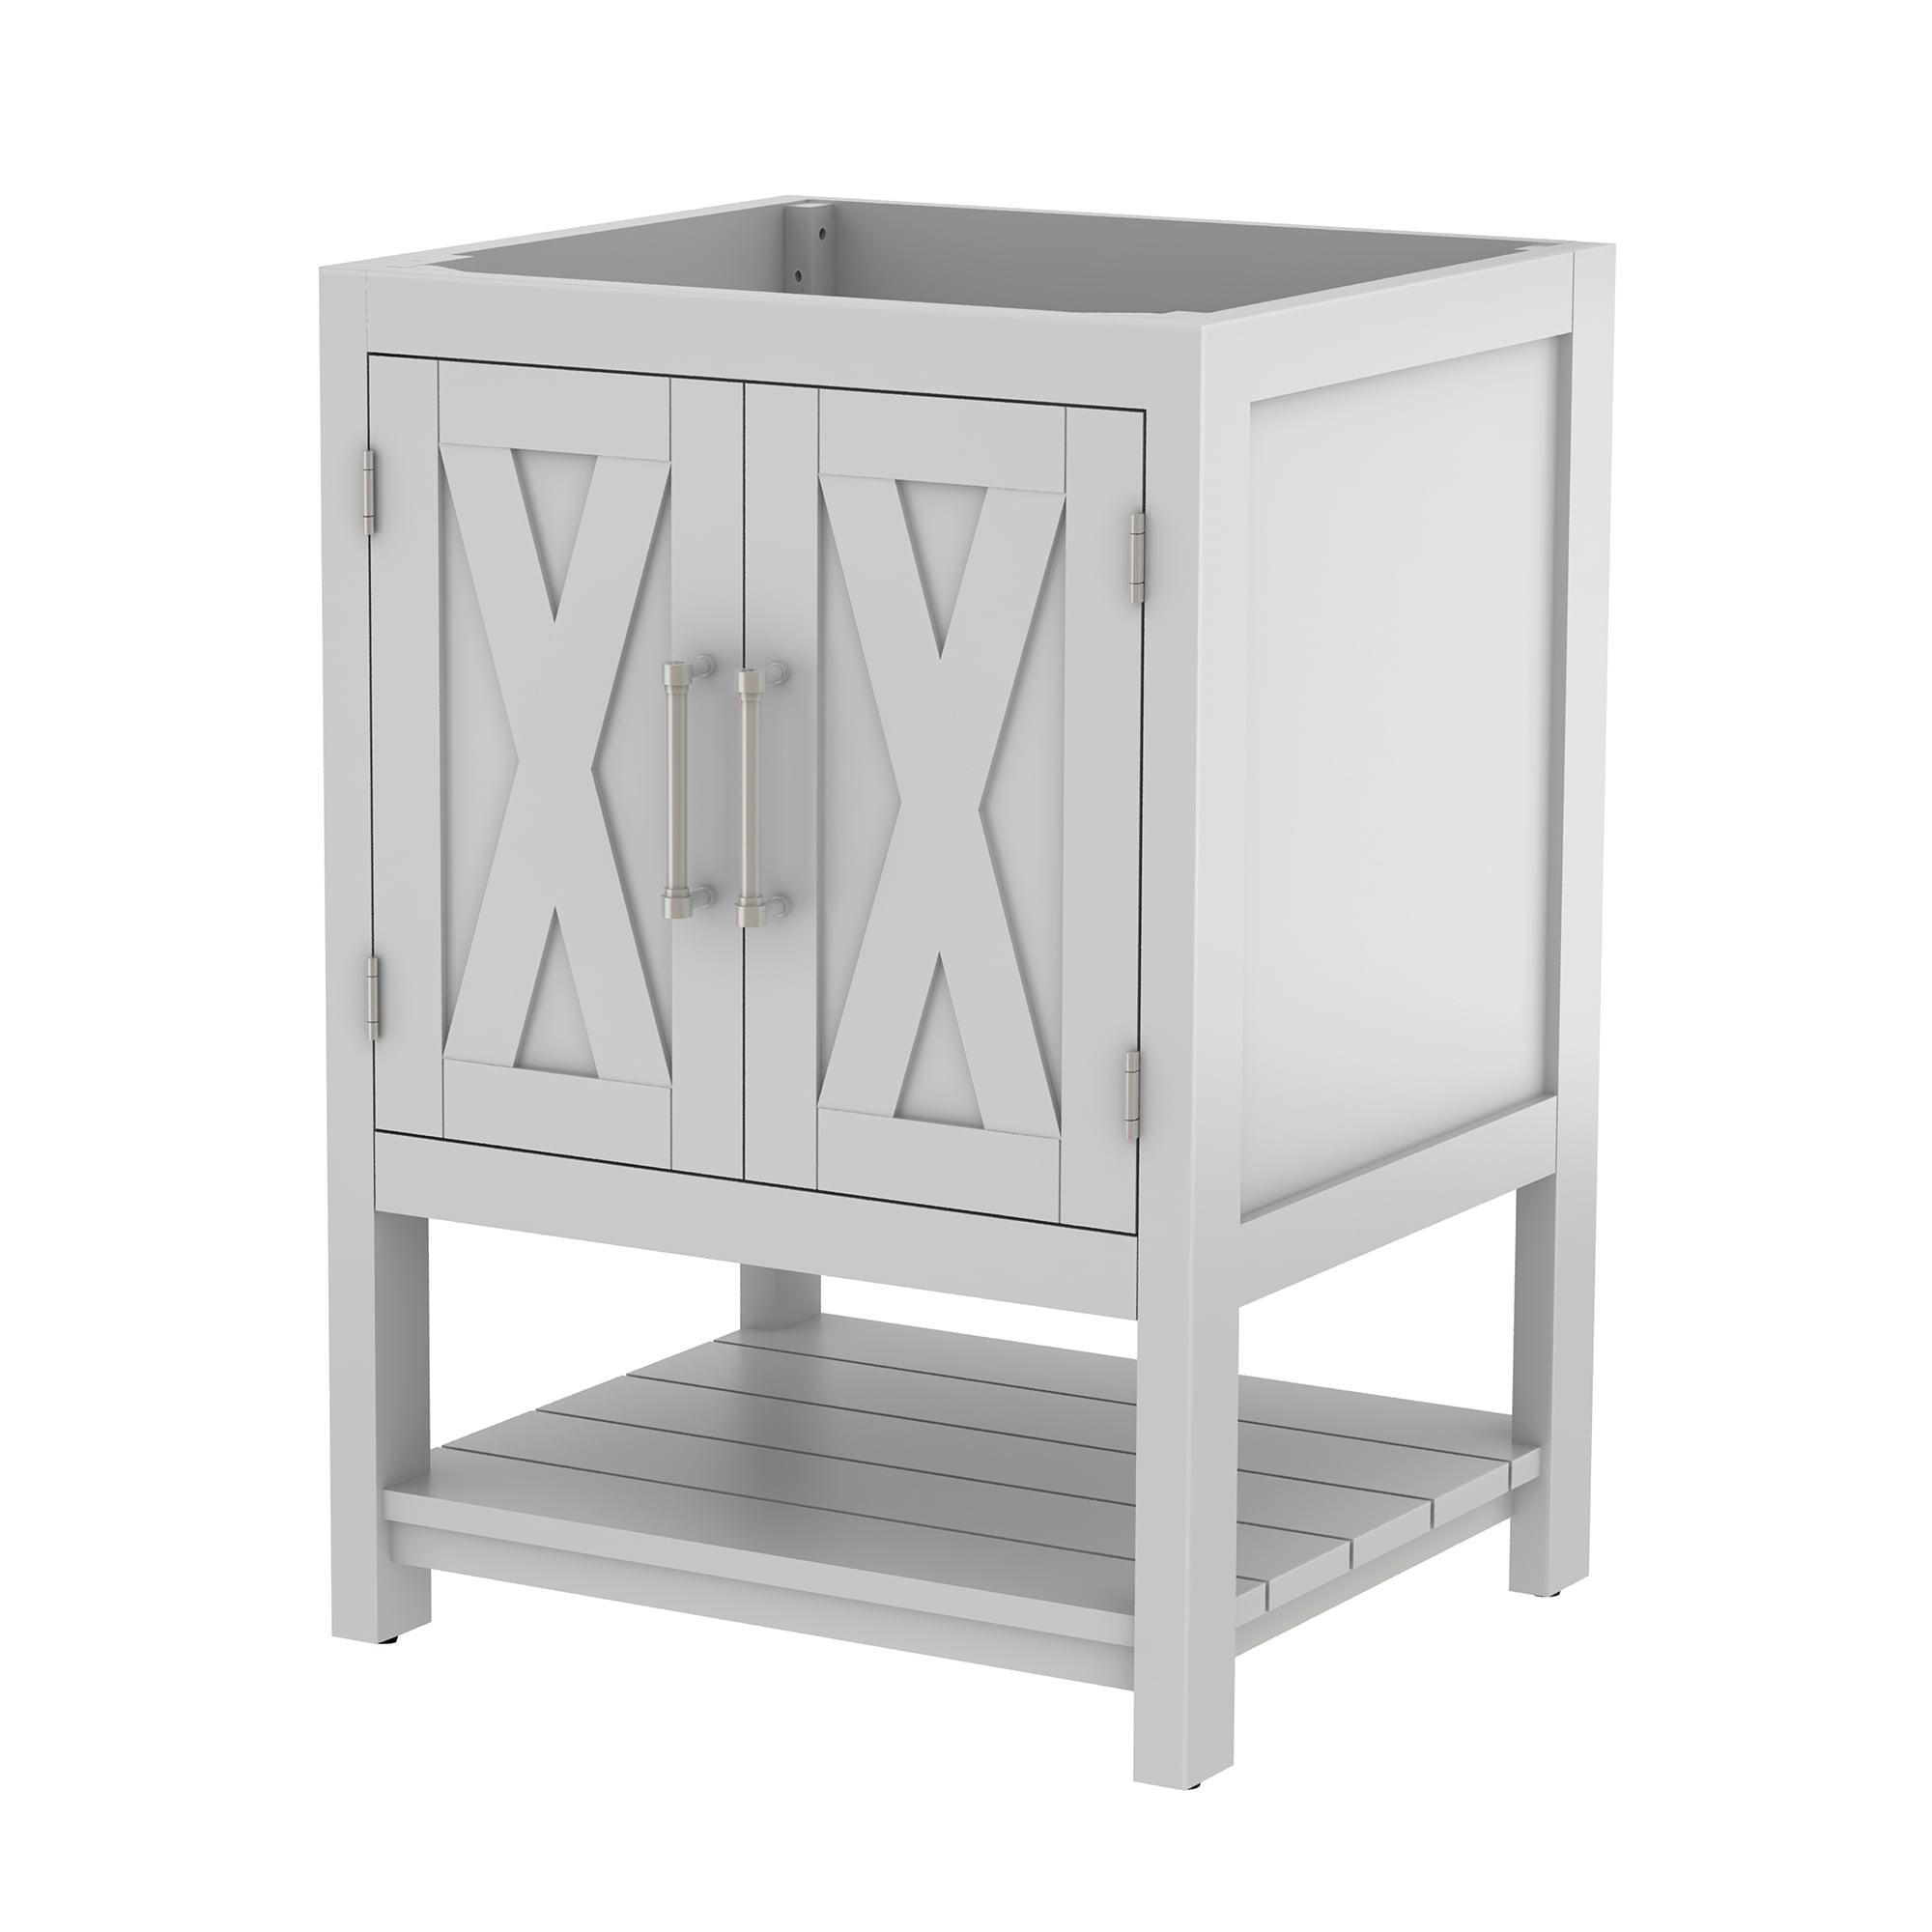 East Camden White Single Sink Bathroom Vanity Base, 24-inch